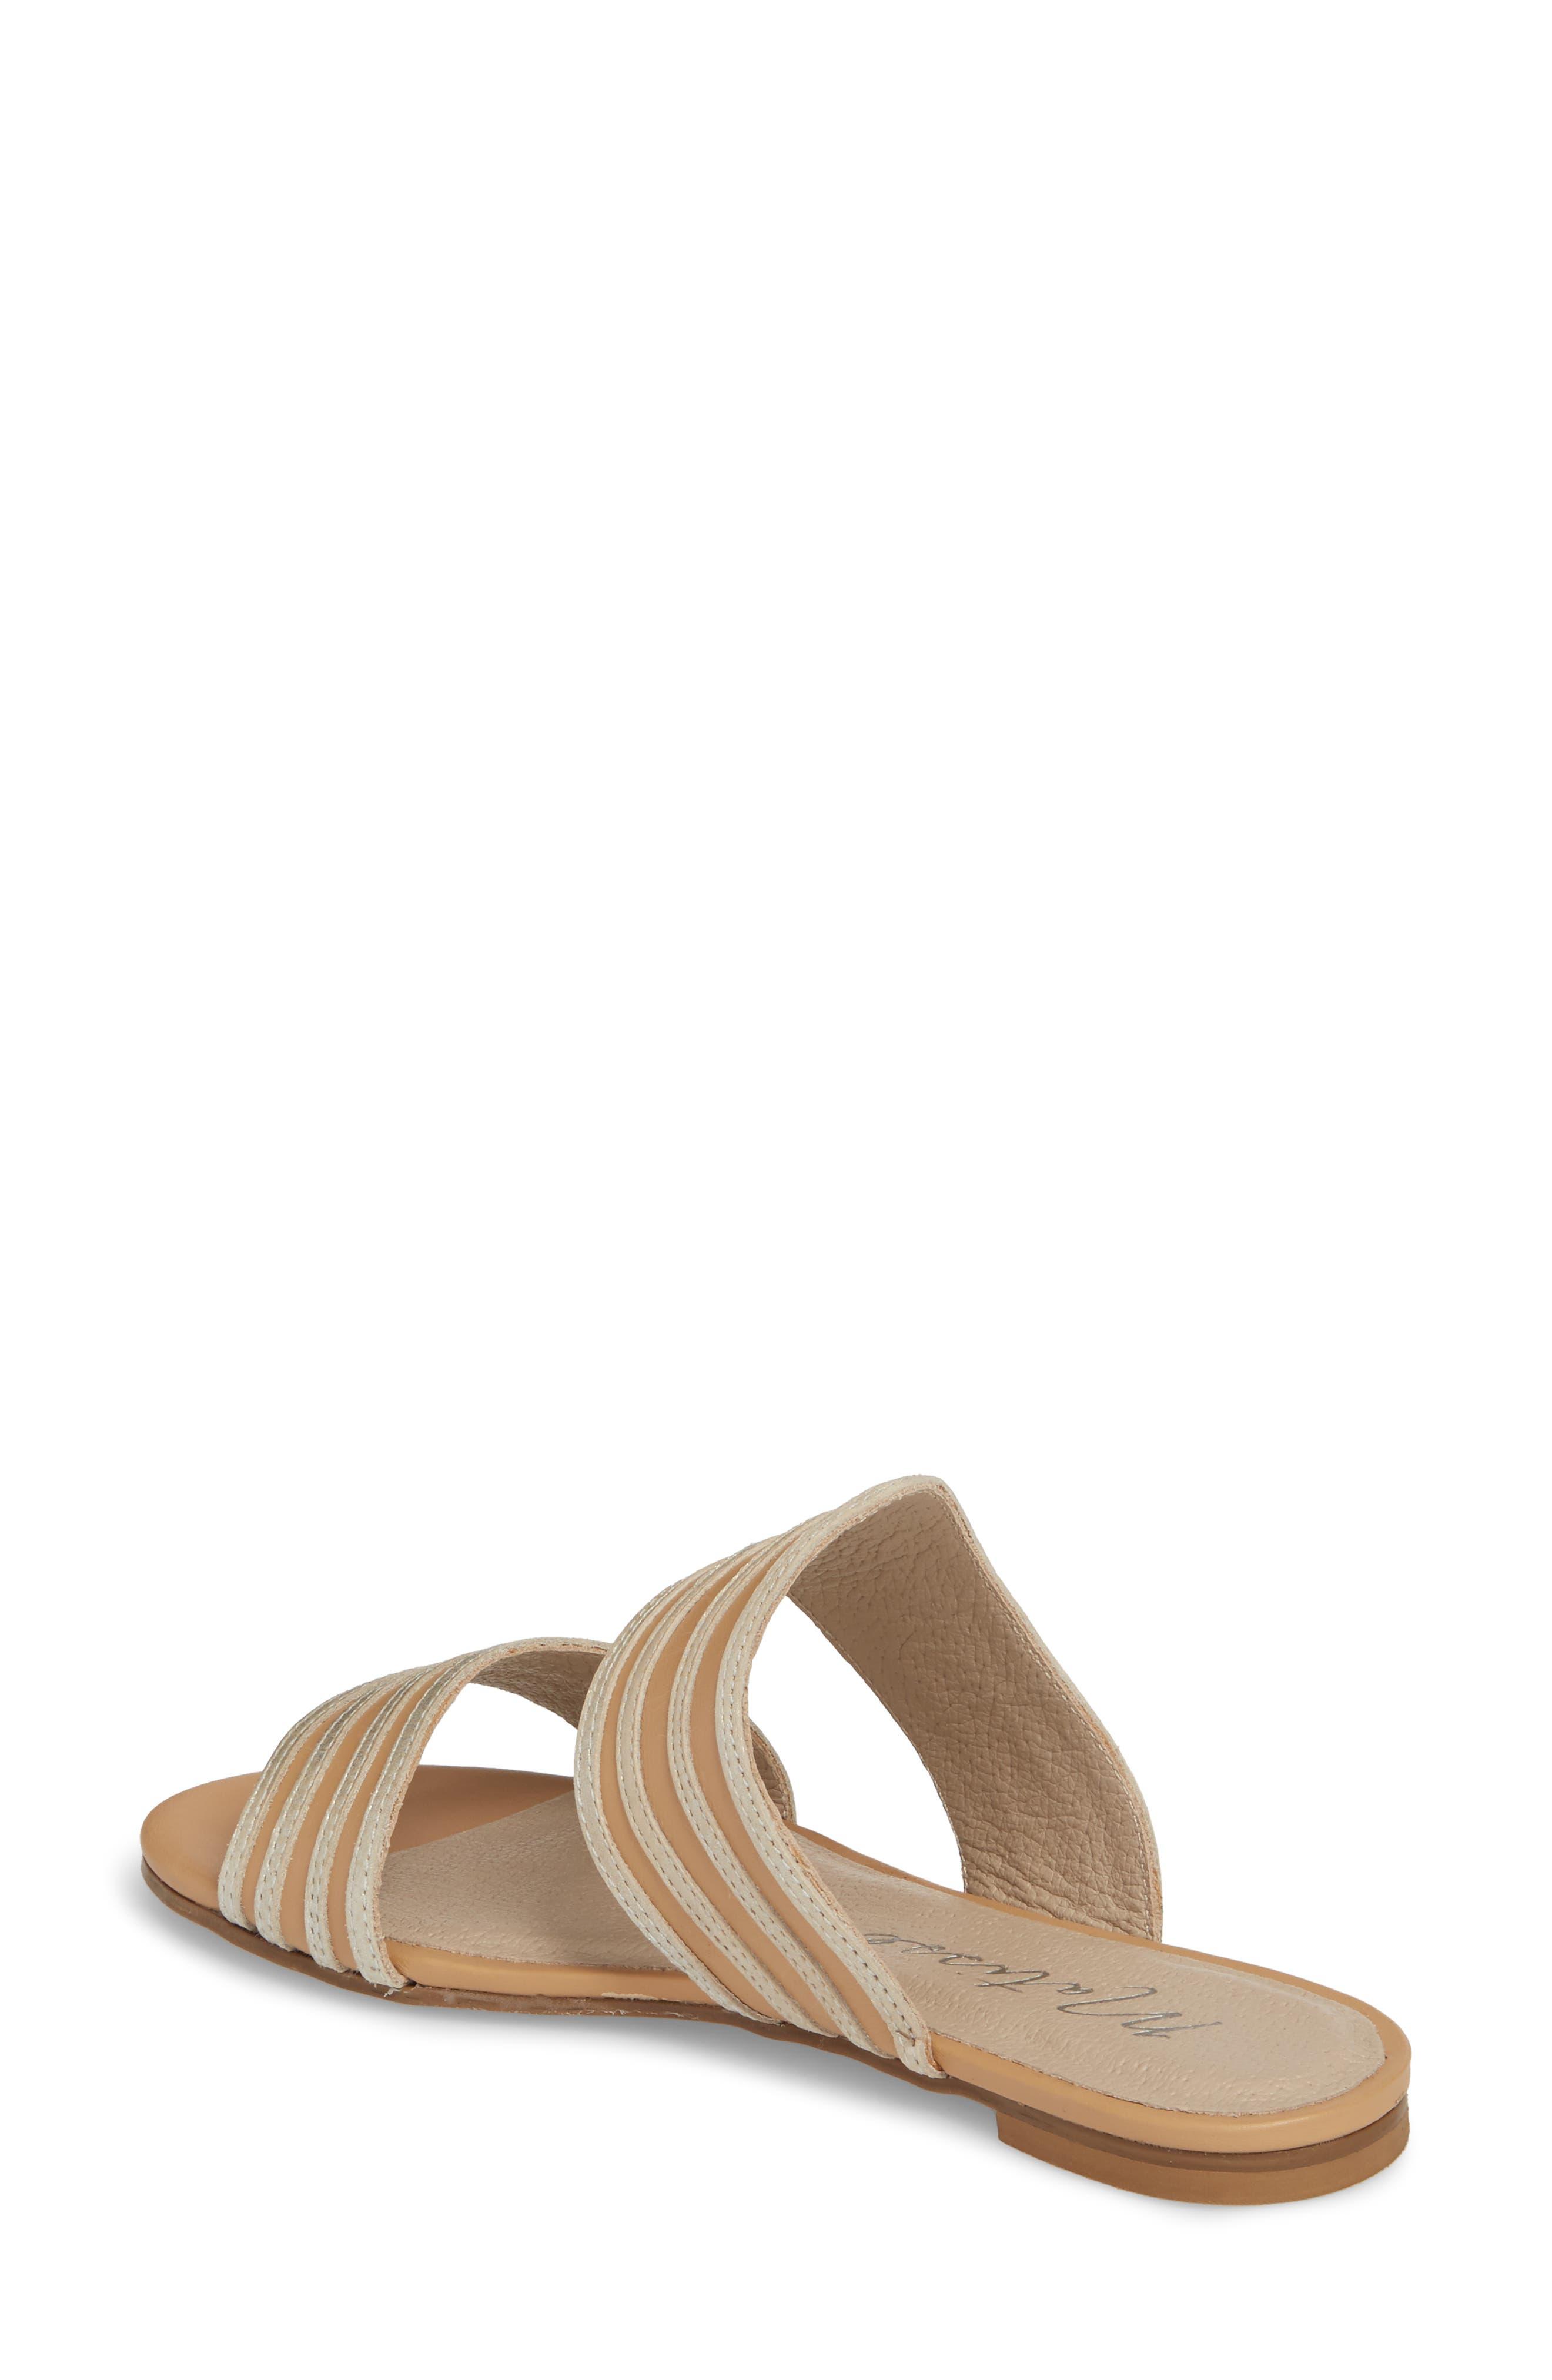 Russo Slide Sandal,                             Alternate thumbnail 2, color,                             Natural/ Silver Leather